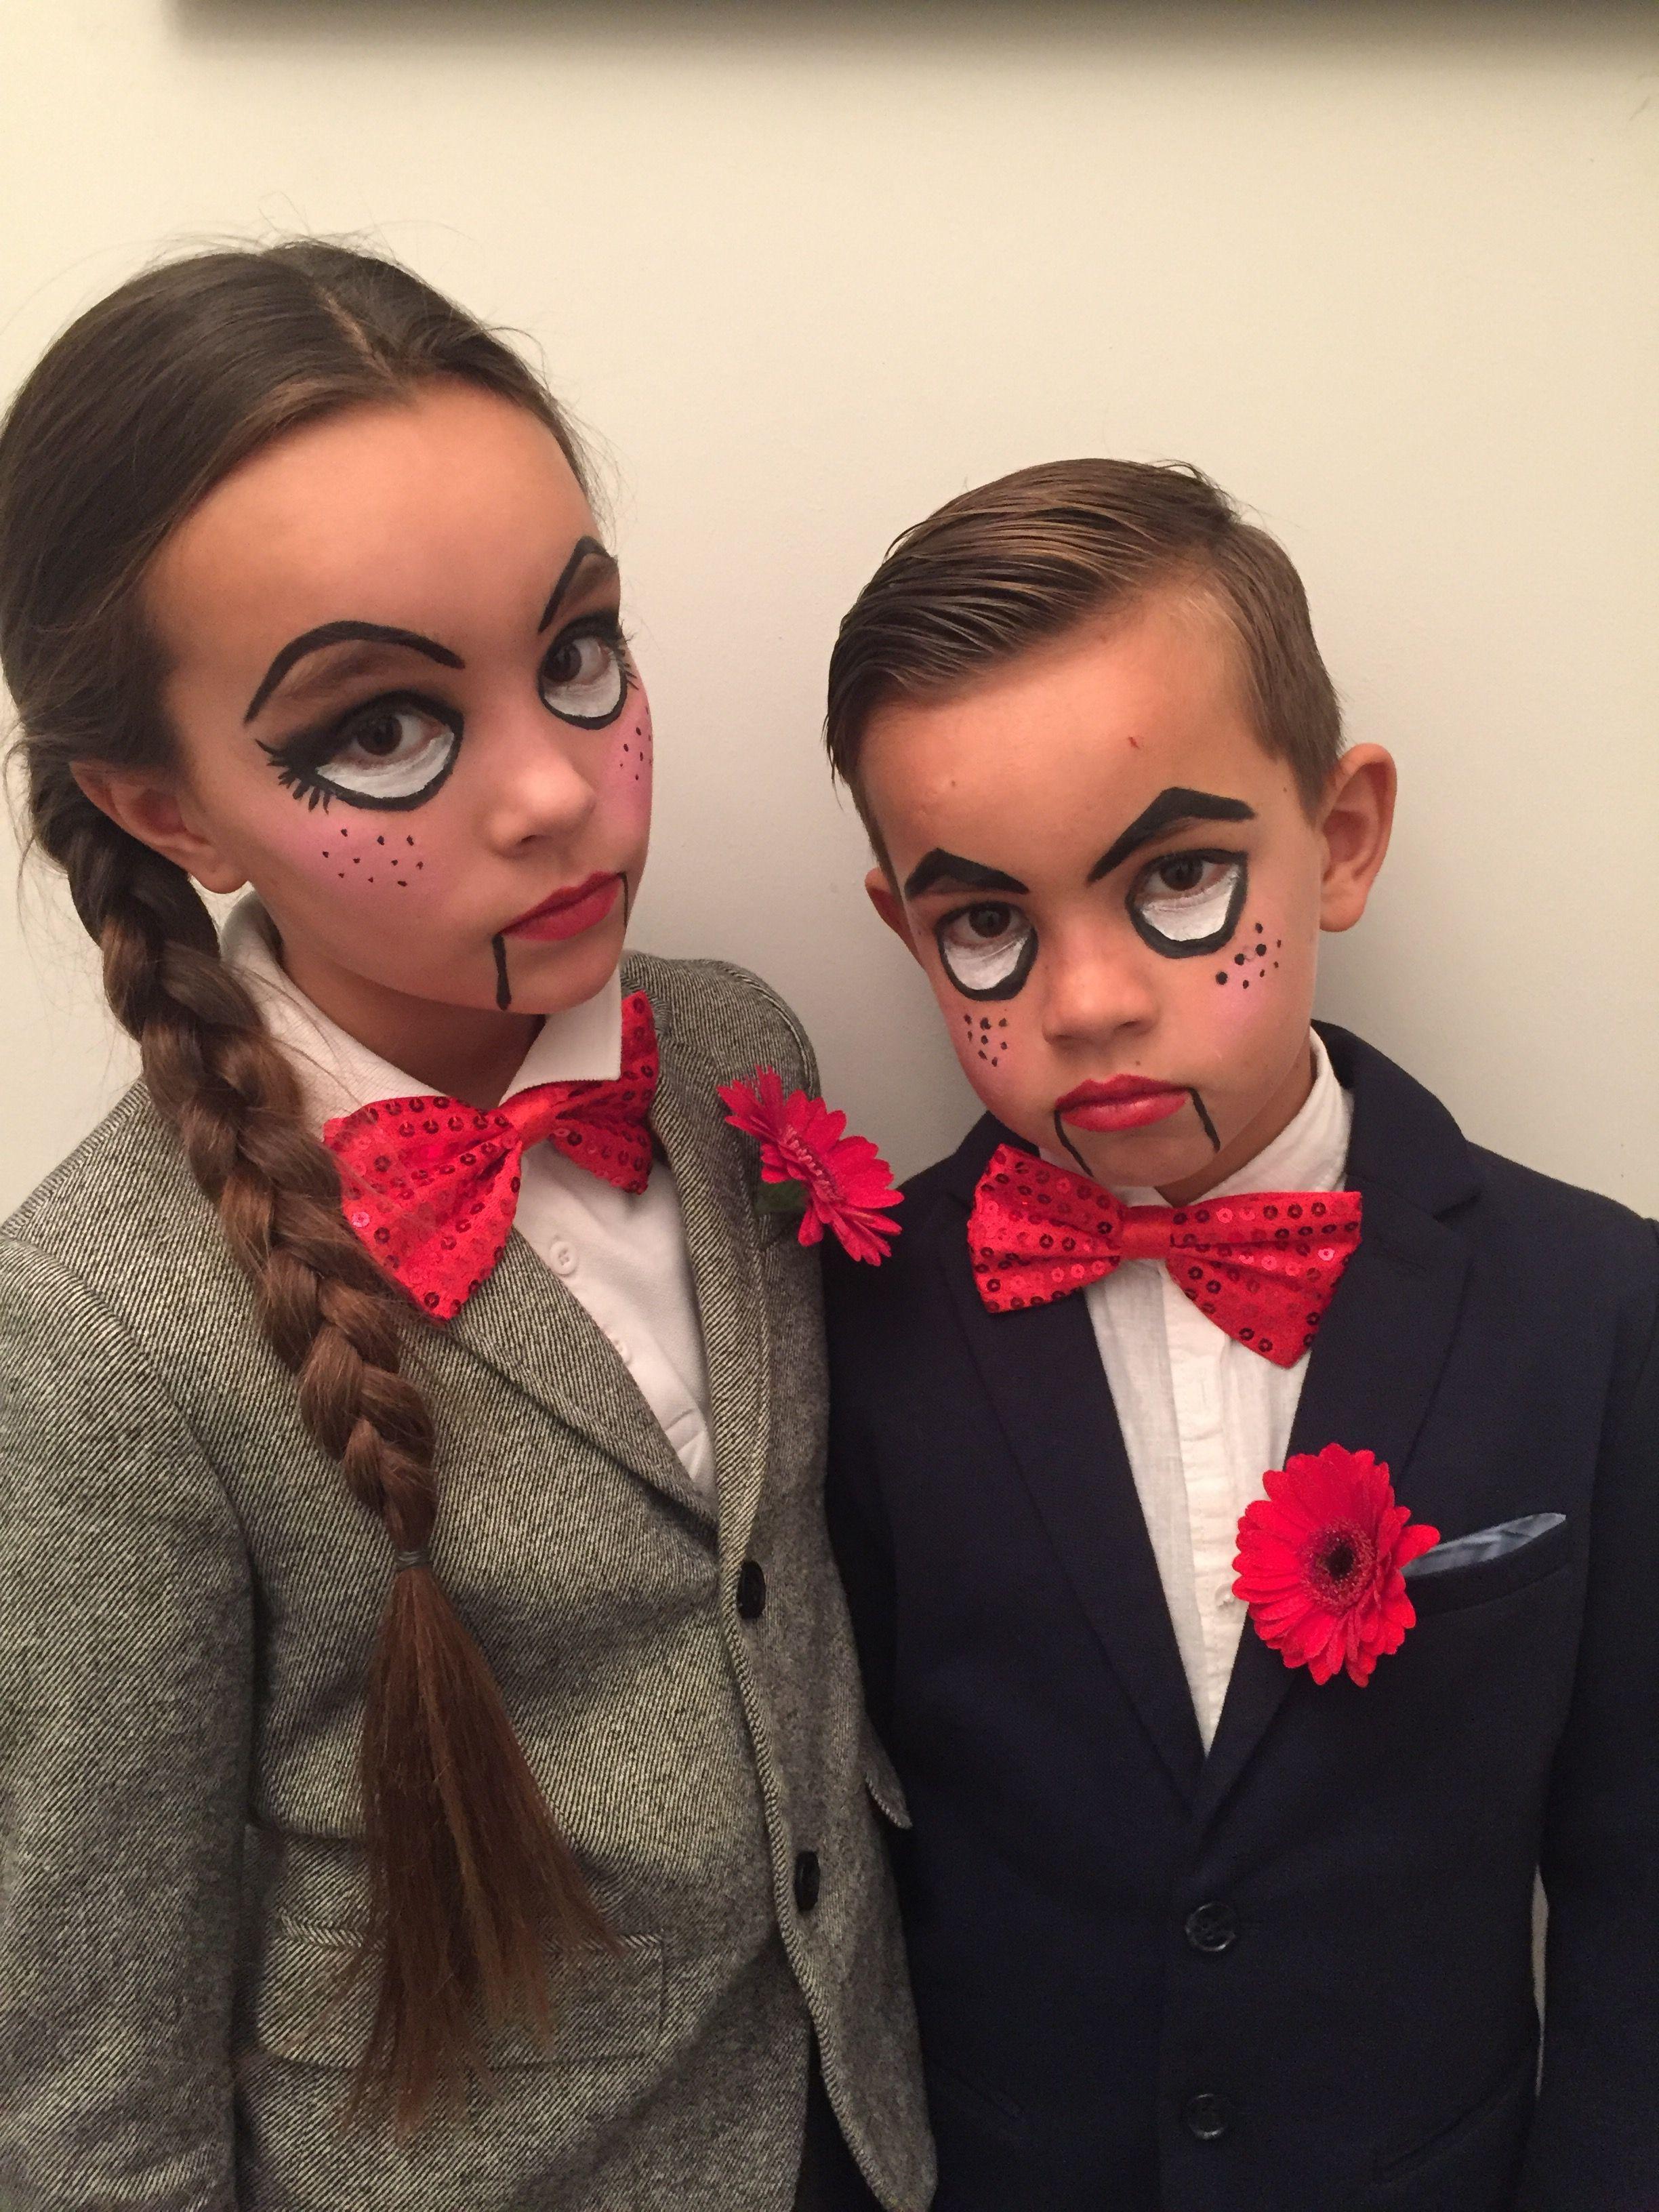 Pin by Blair Guba on Halloween Creepy halloween costumes